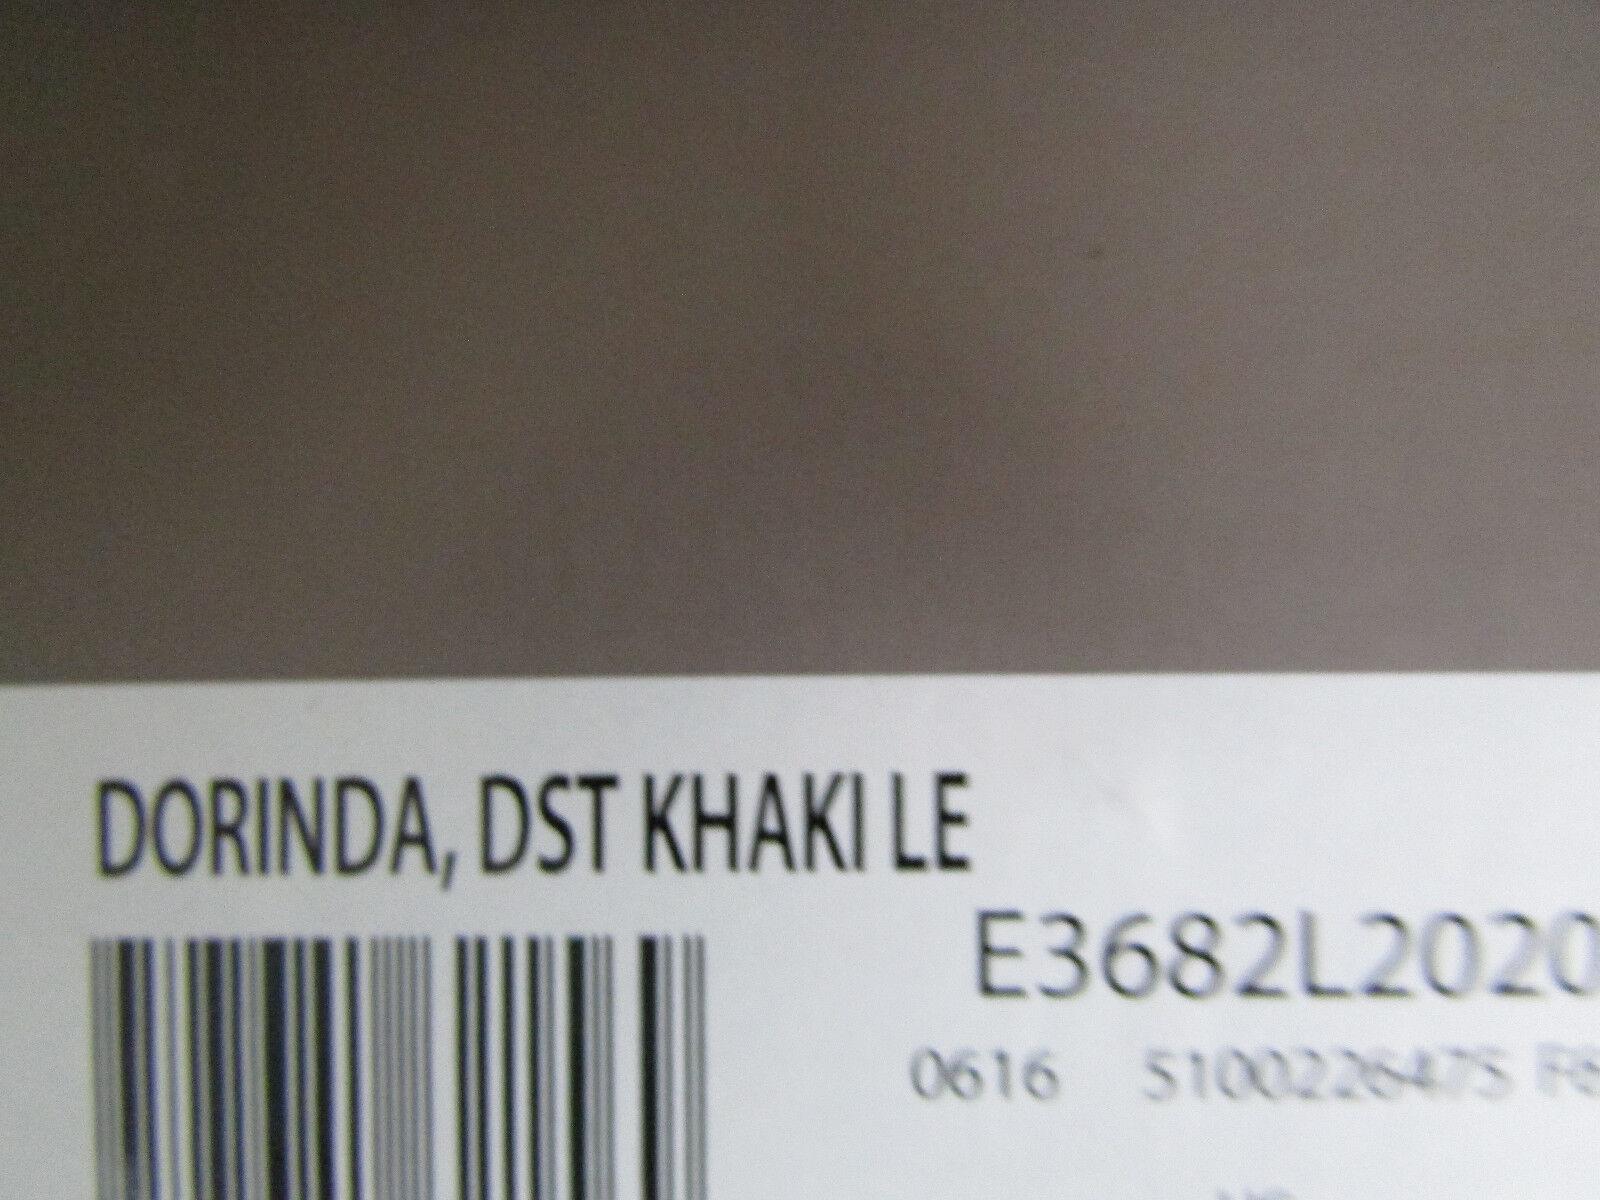 NEW FRANCO SARTO DORINDA DORINDA DORINDA ANKLE BOOTIES BOOTS WOMENS 9.5 KHAKI COGNAC  FREE SHIP 032494